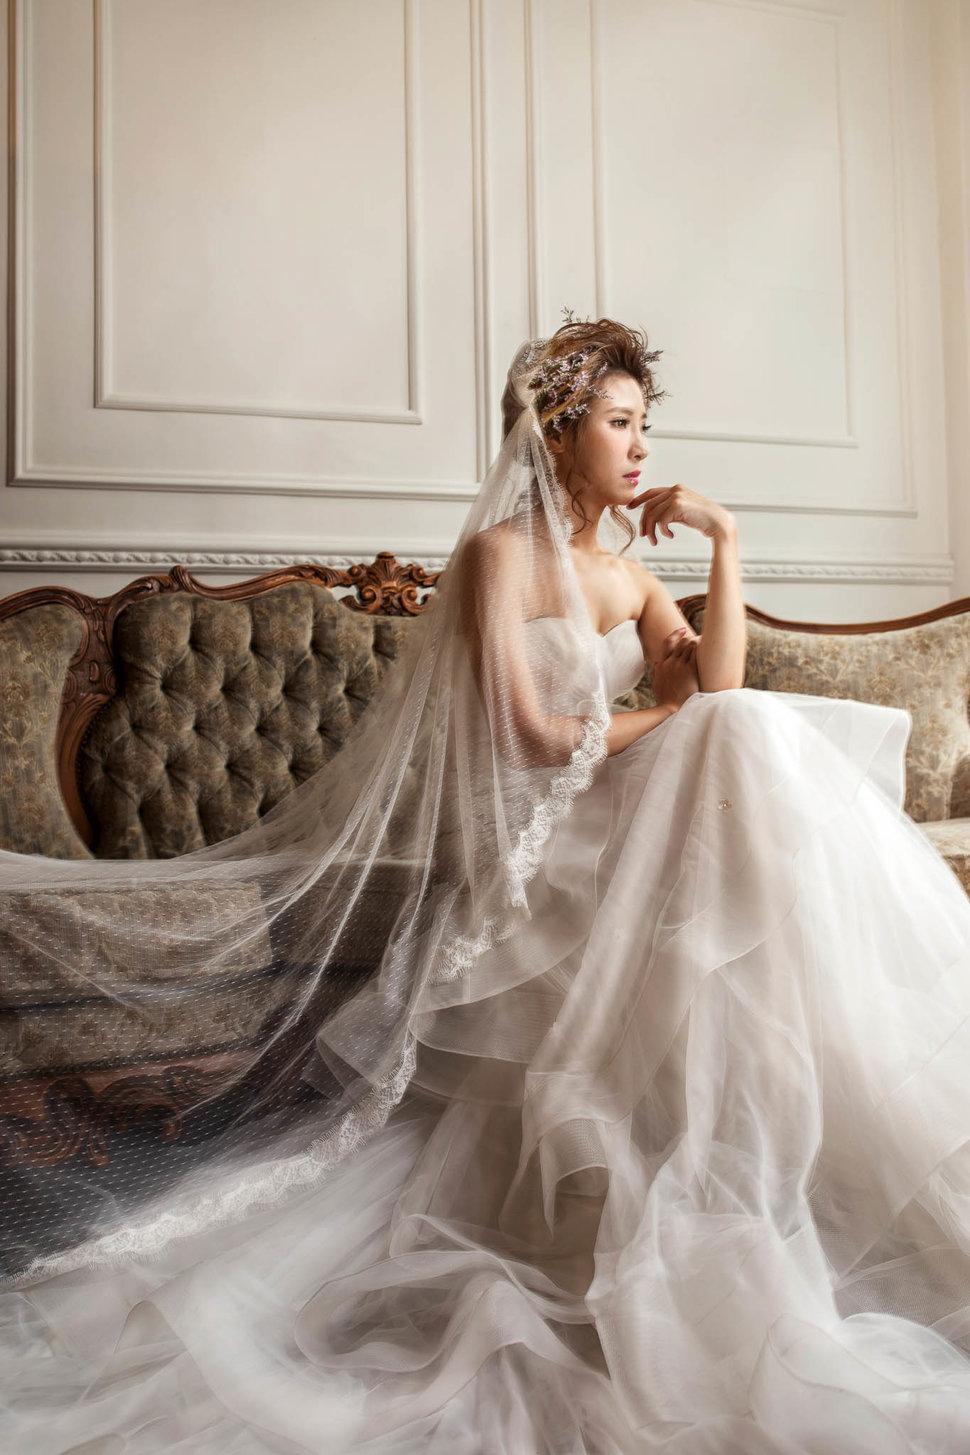 18PHOTO自主婚紗-潤兒(編號:406244) - 18PHOTO 婚紗影像攝影工作室 - 結婚吧